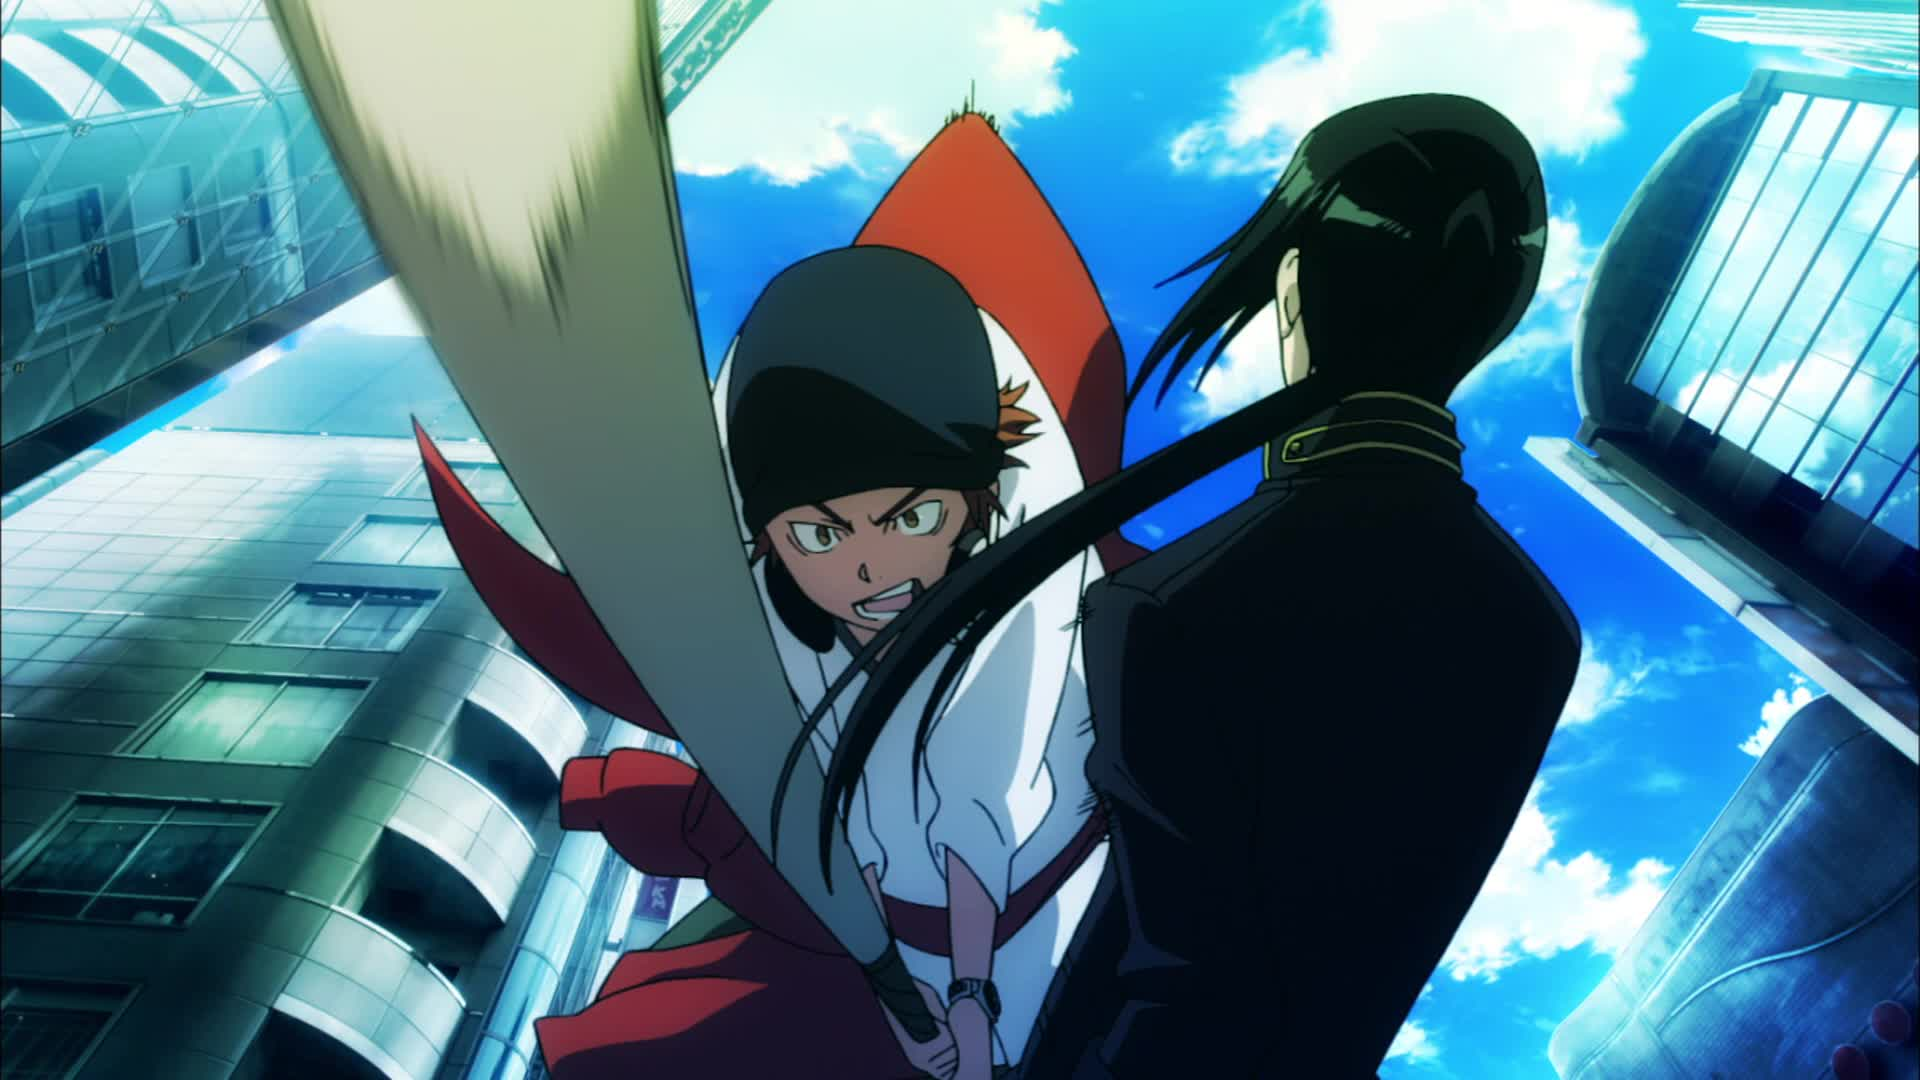 K_Anime_6